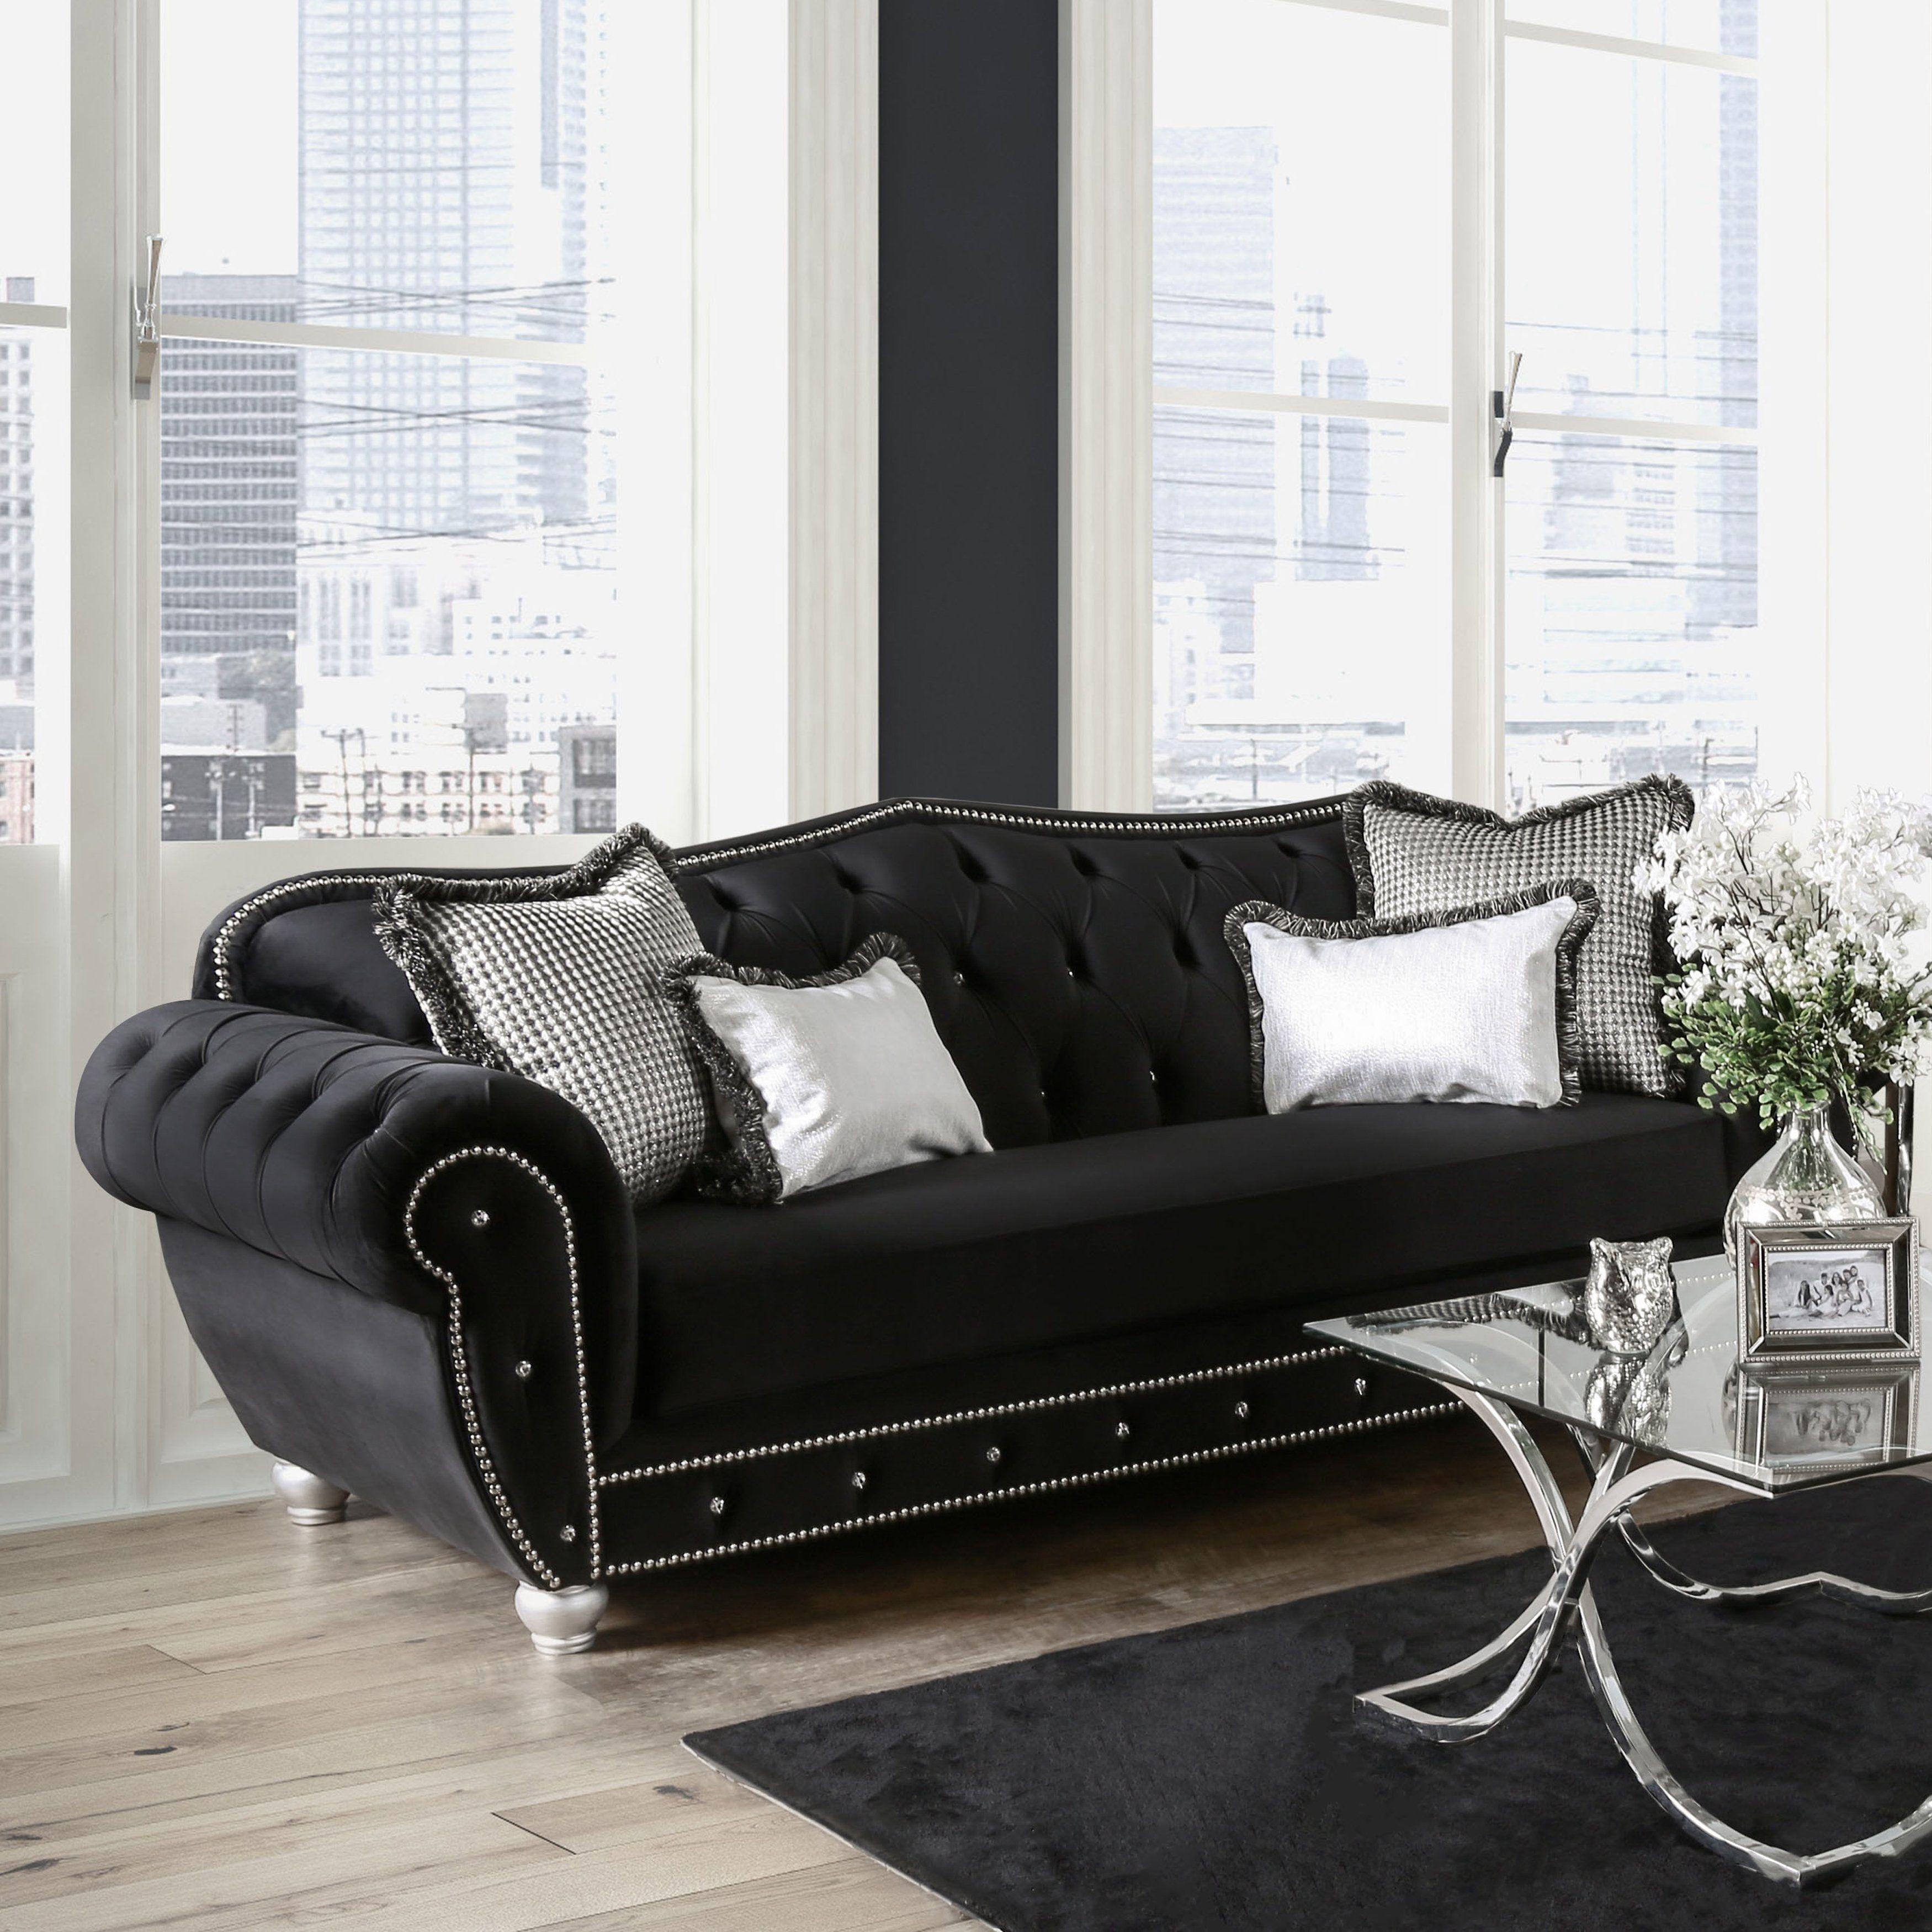 Online Shopping Bedding Furniture Electronics Jewelry Clothing More Furniture Black Fabric Sofa Black Sofa